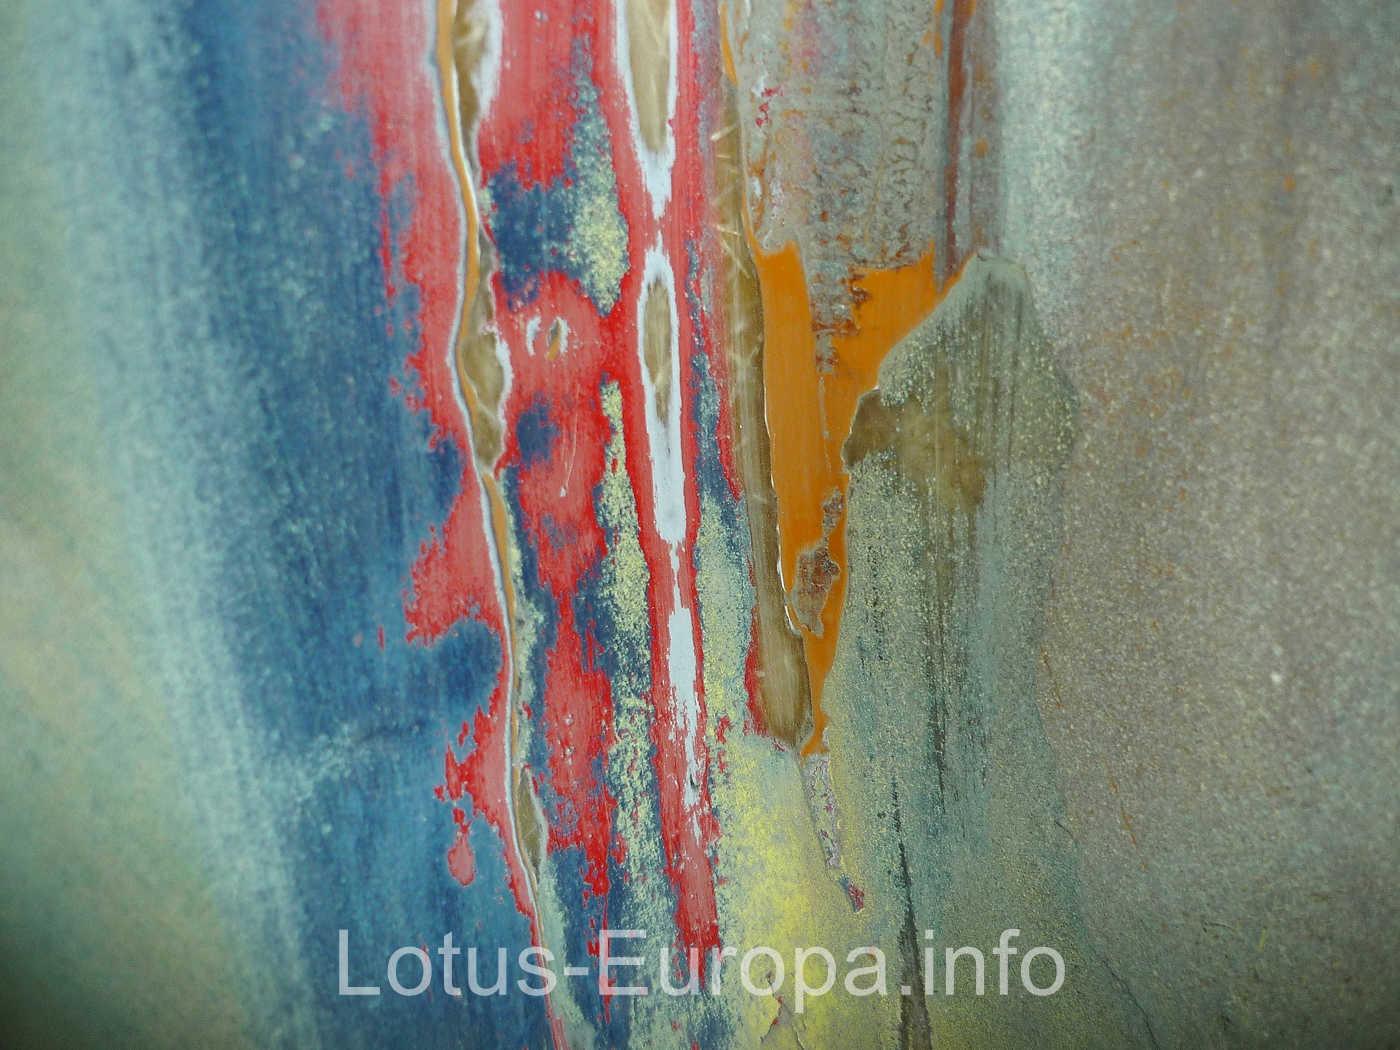 Lotus Europa S2 colours